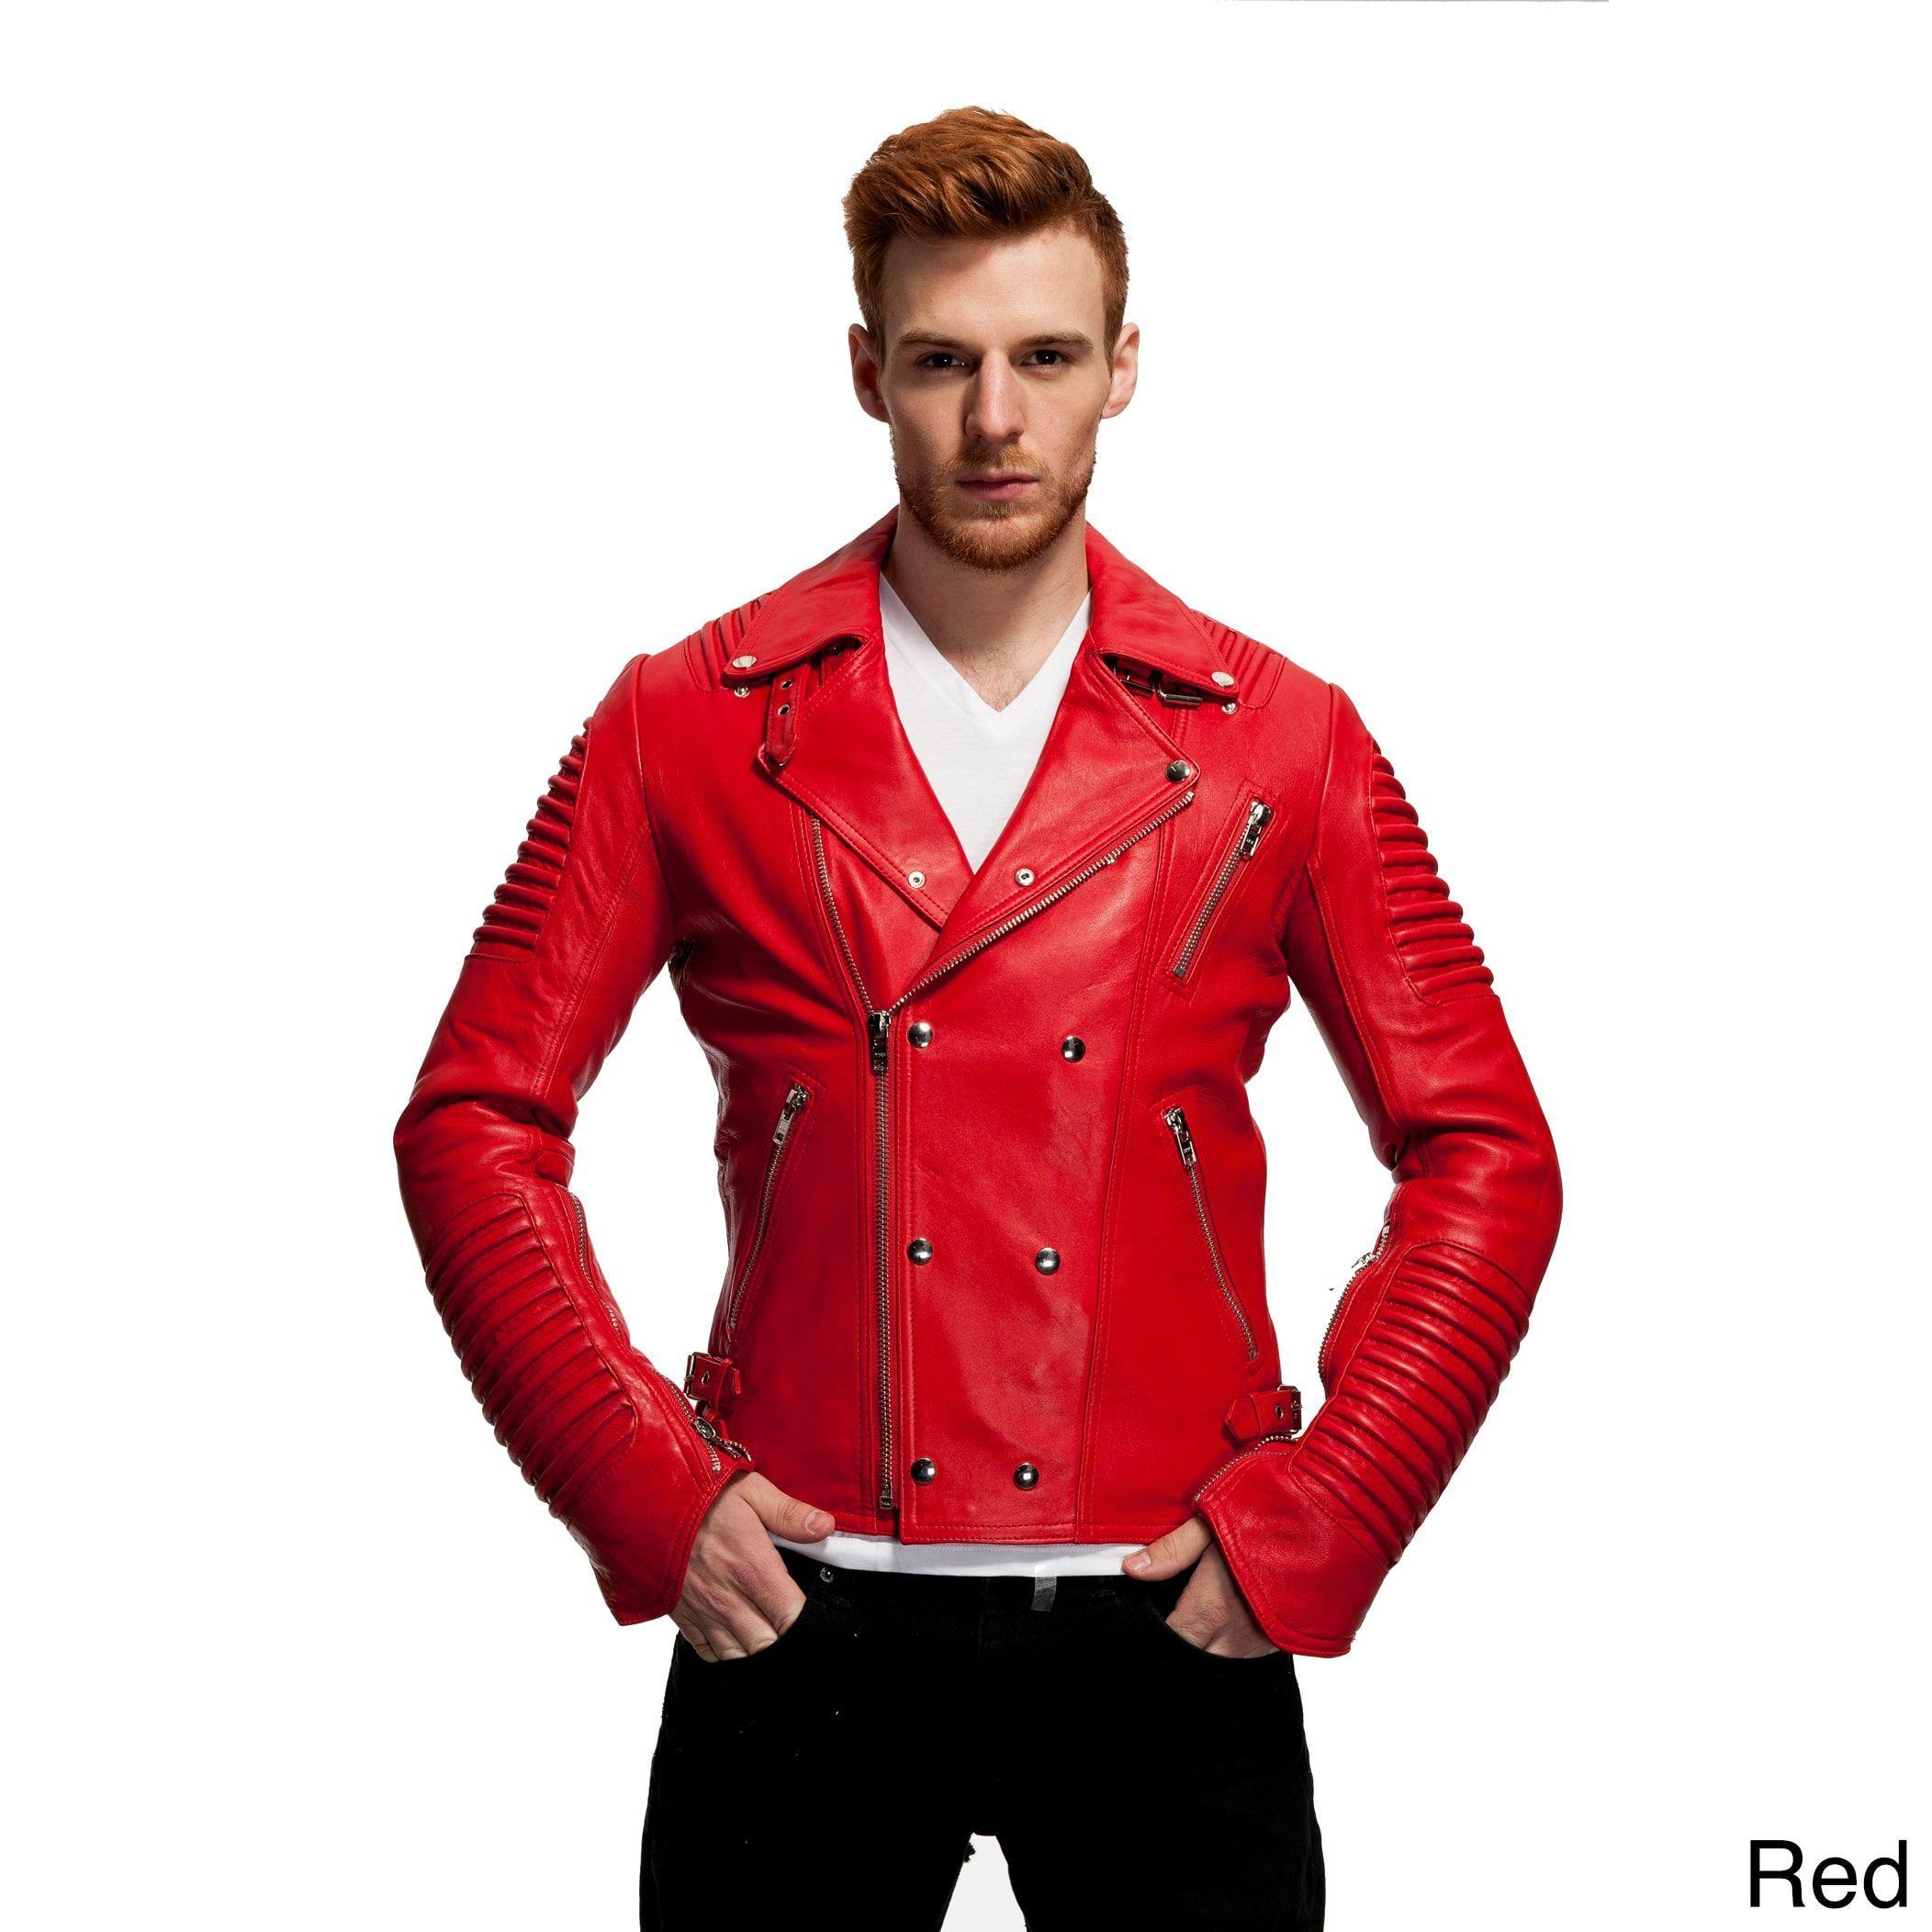 bfdc0e8a4 Mason & Cooper Men's The Empire Leather Moto Jacket (Red - 3XL ...